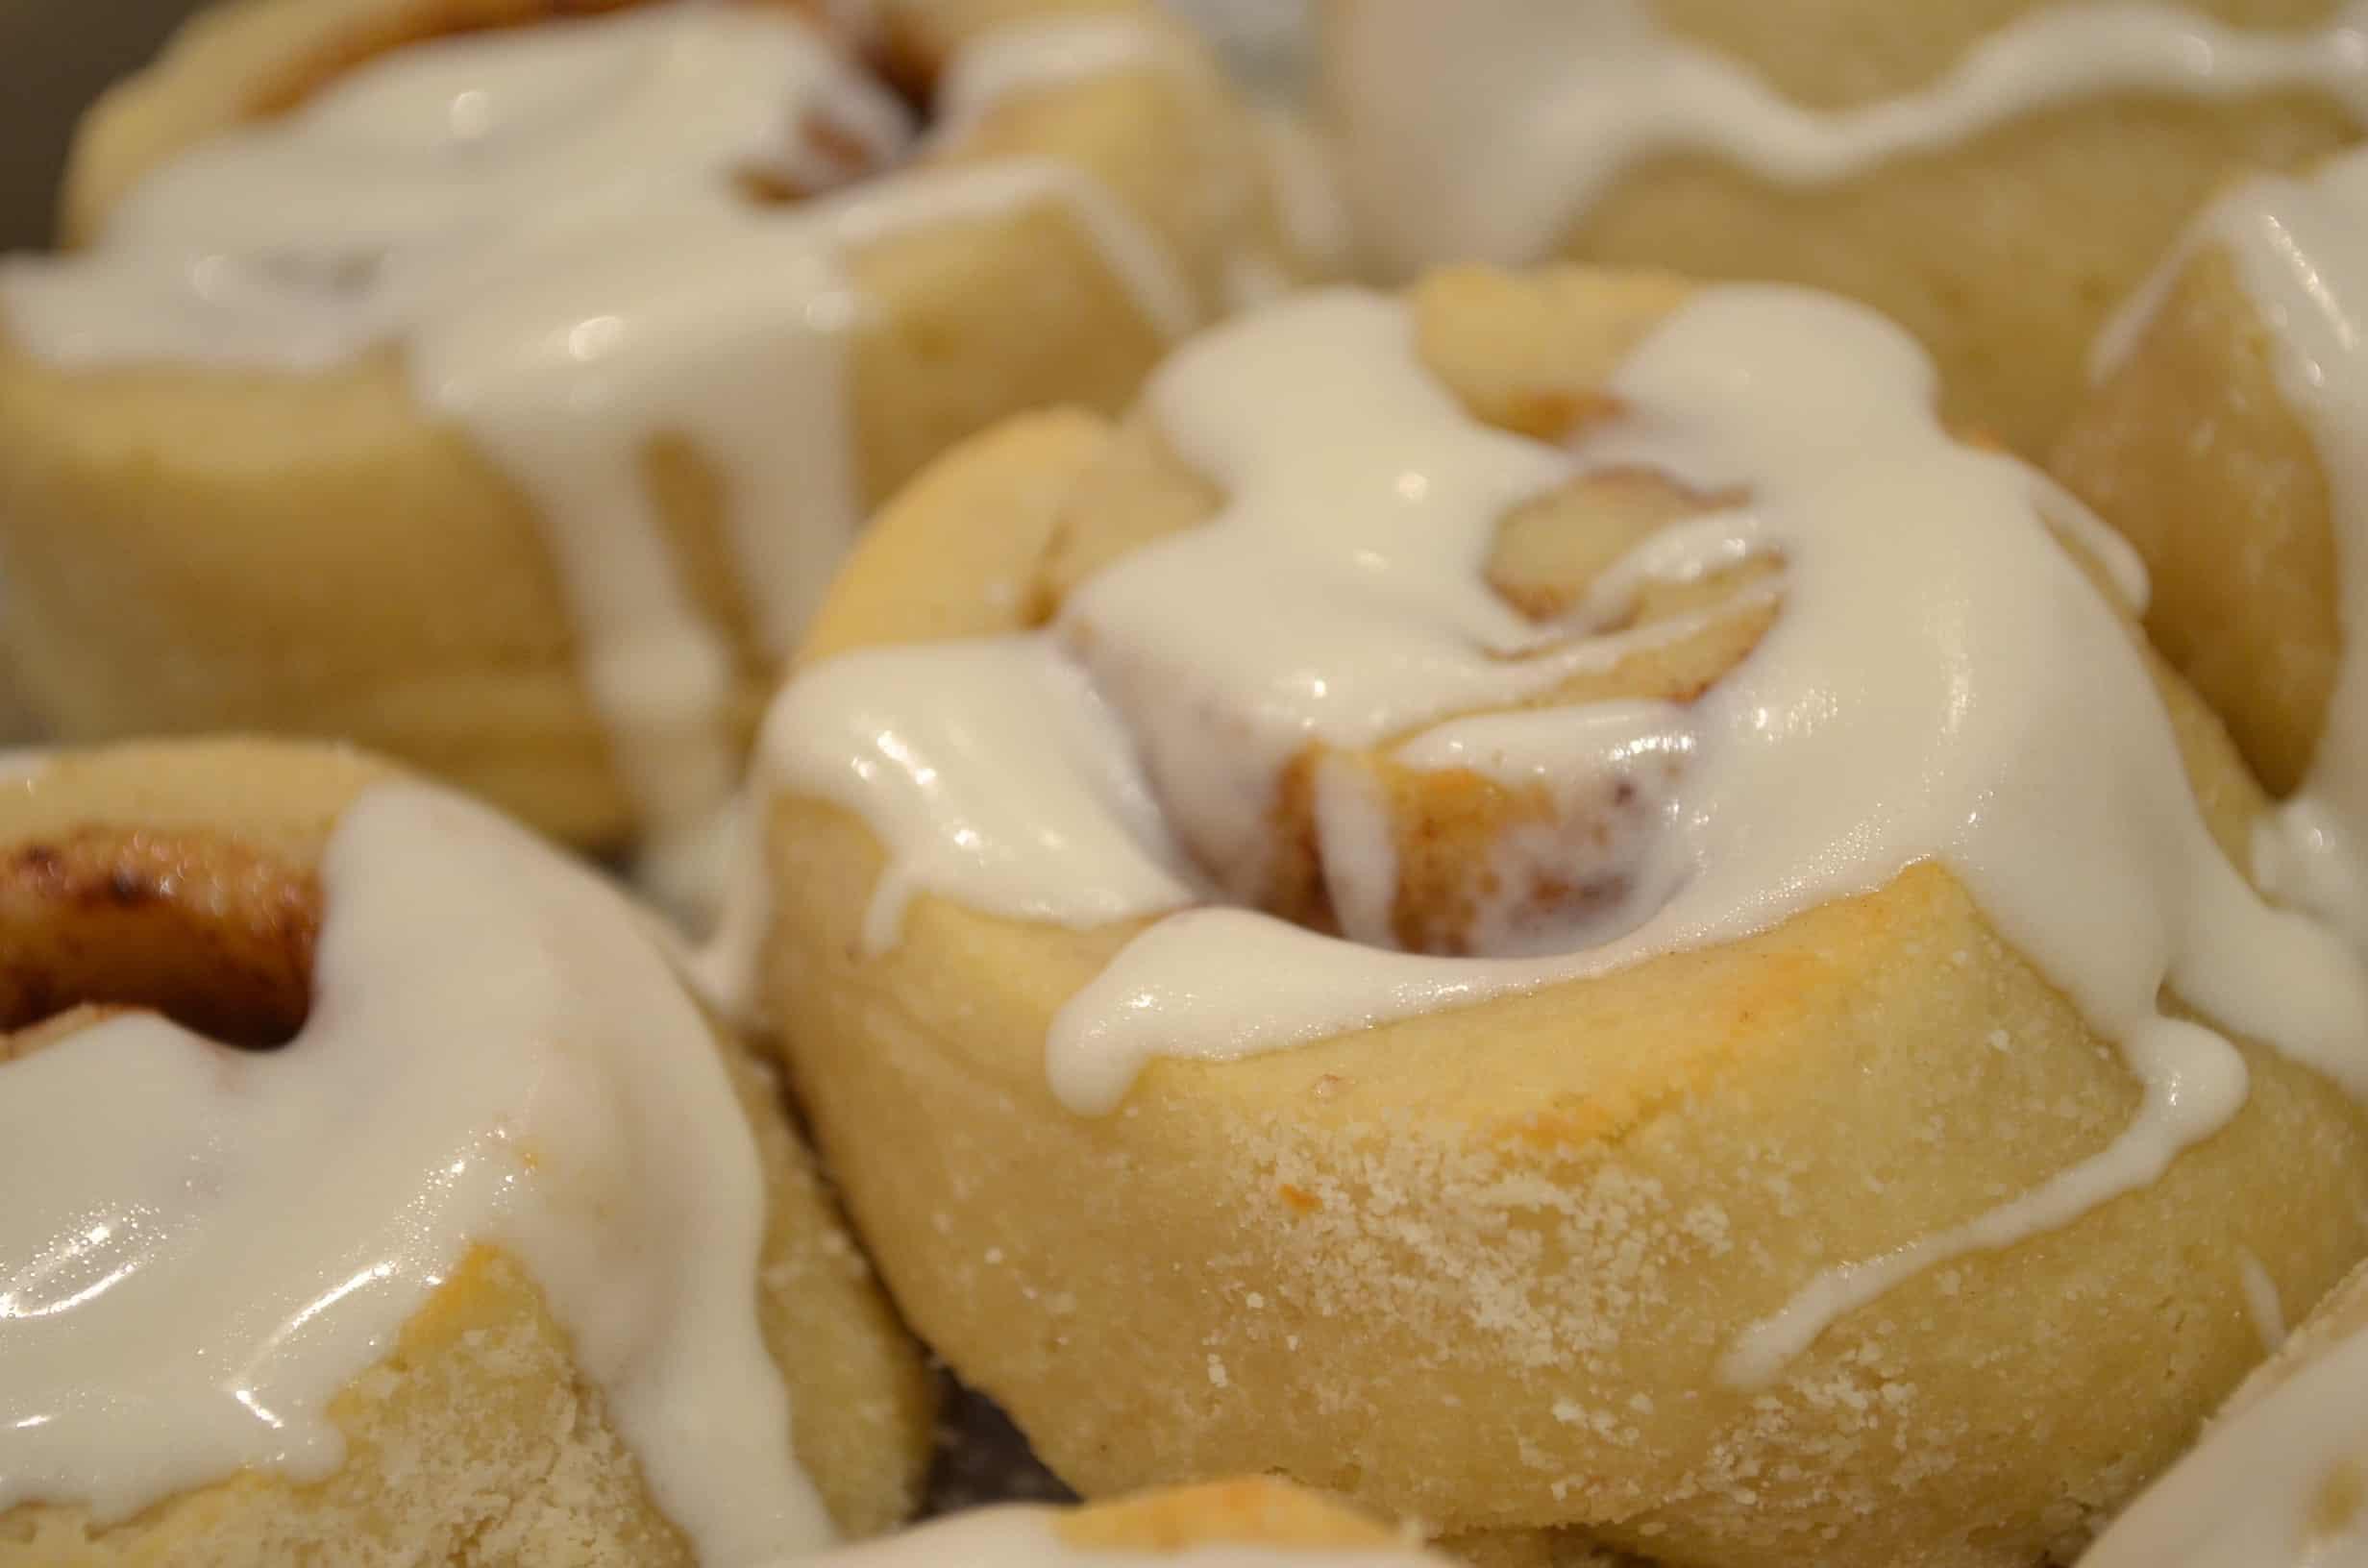 keto cinnamon rolls cream cheese frosting